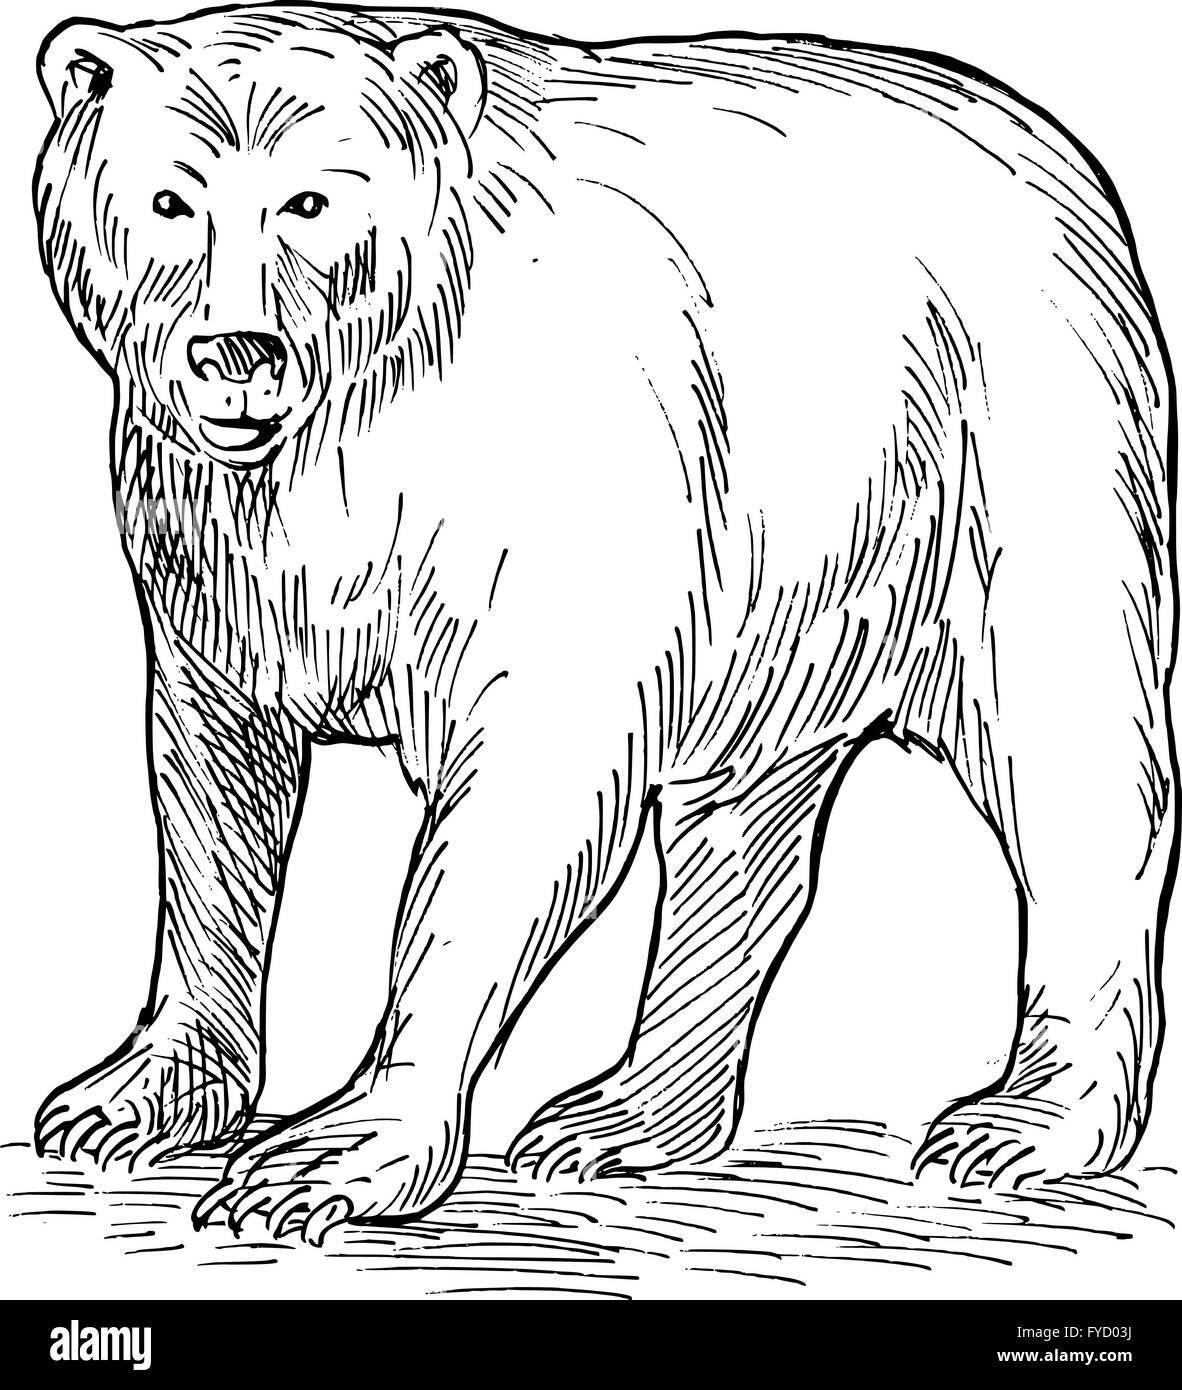 Bear Drawing Imágenes De Stock & Bear Drawing Fotos De Stock - Alamy